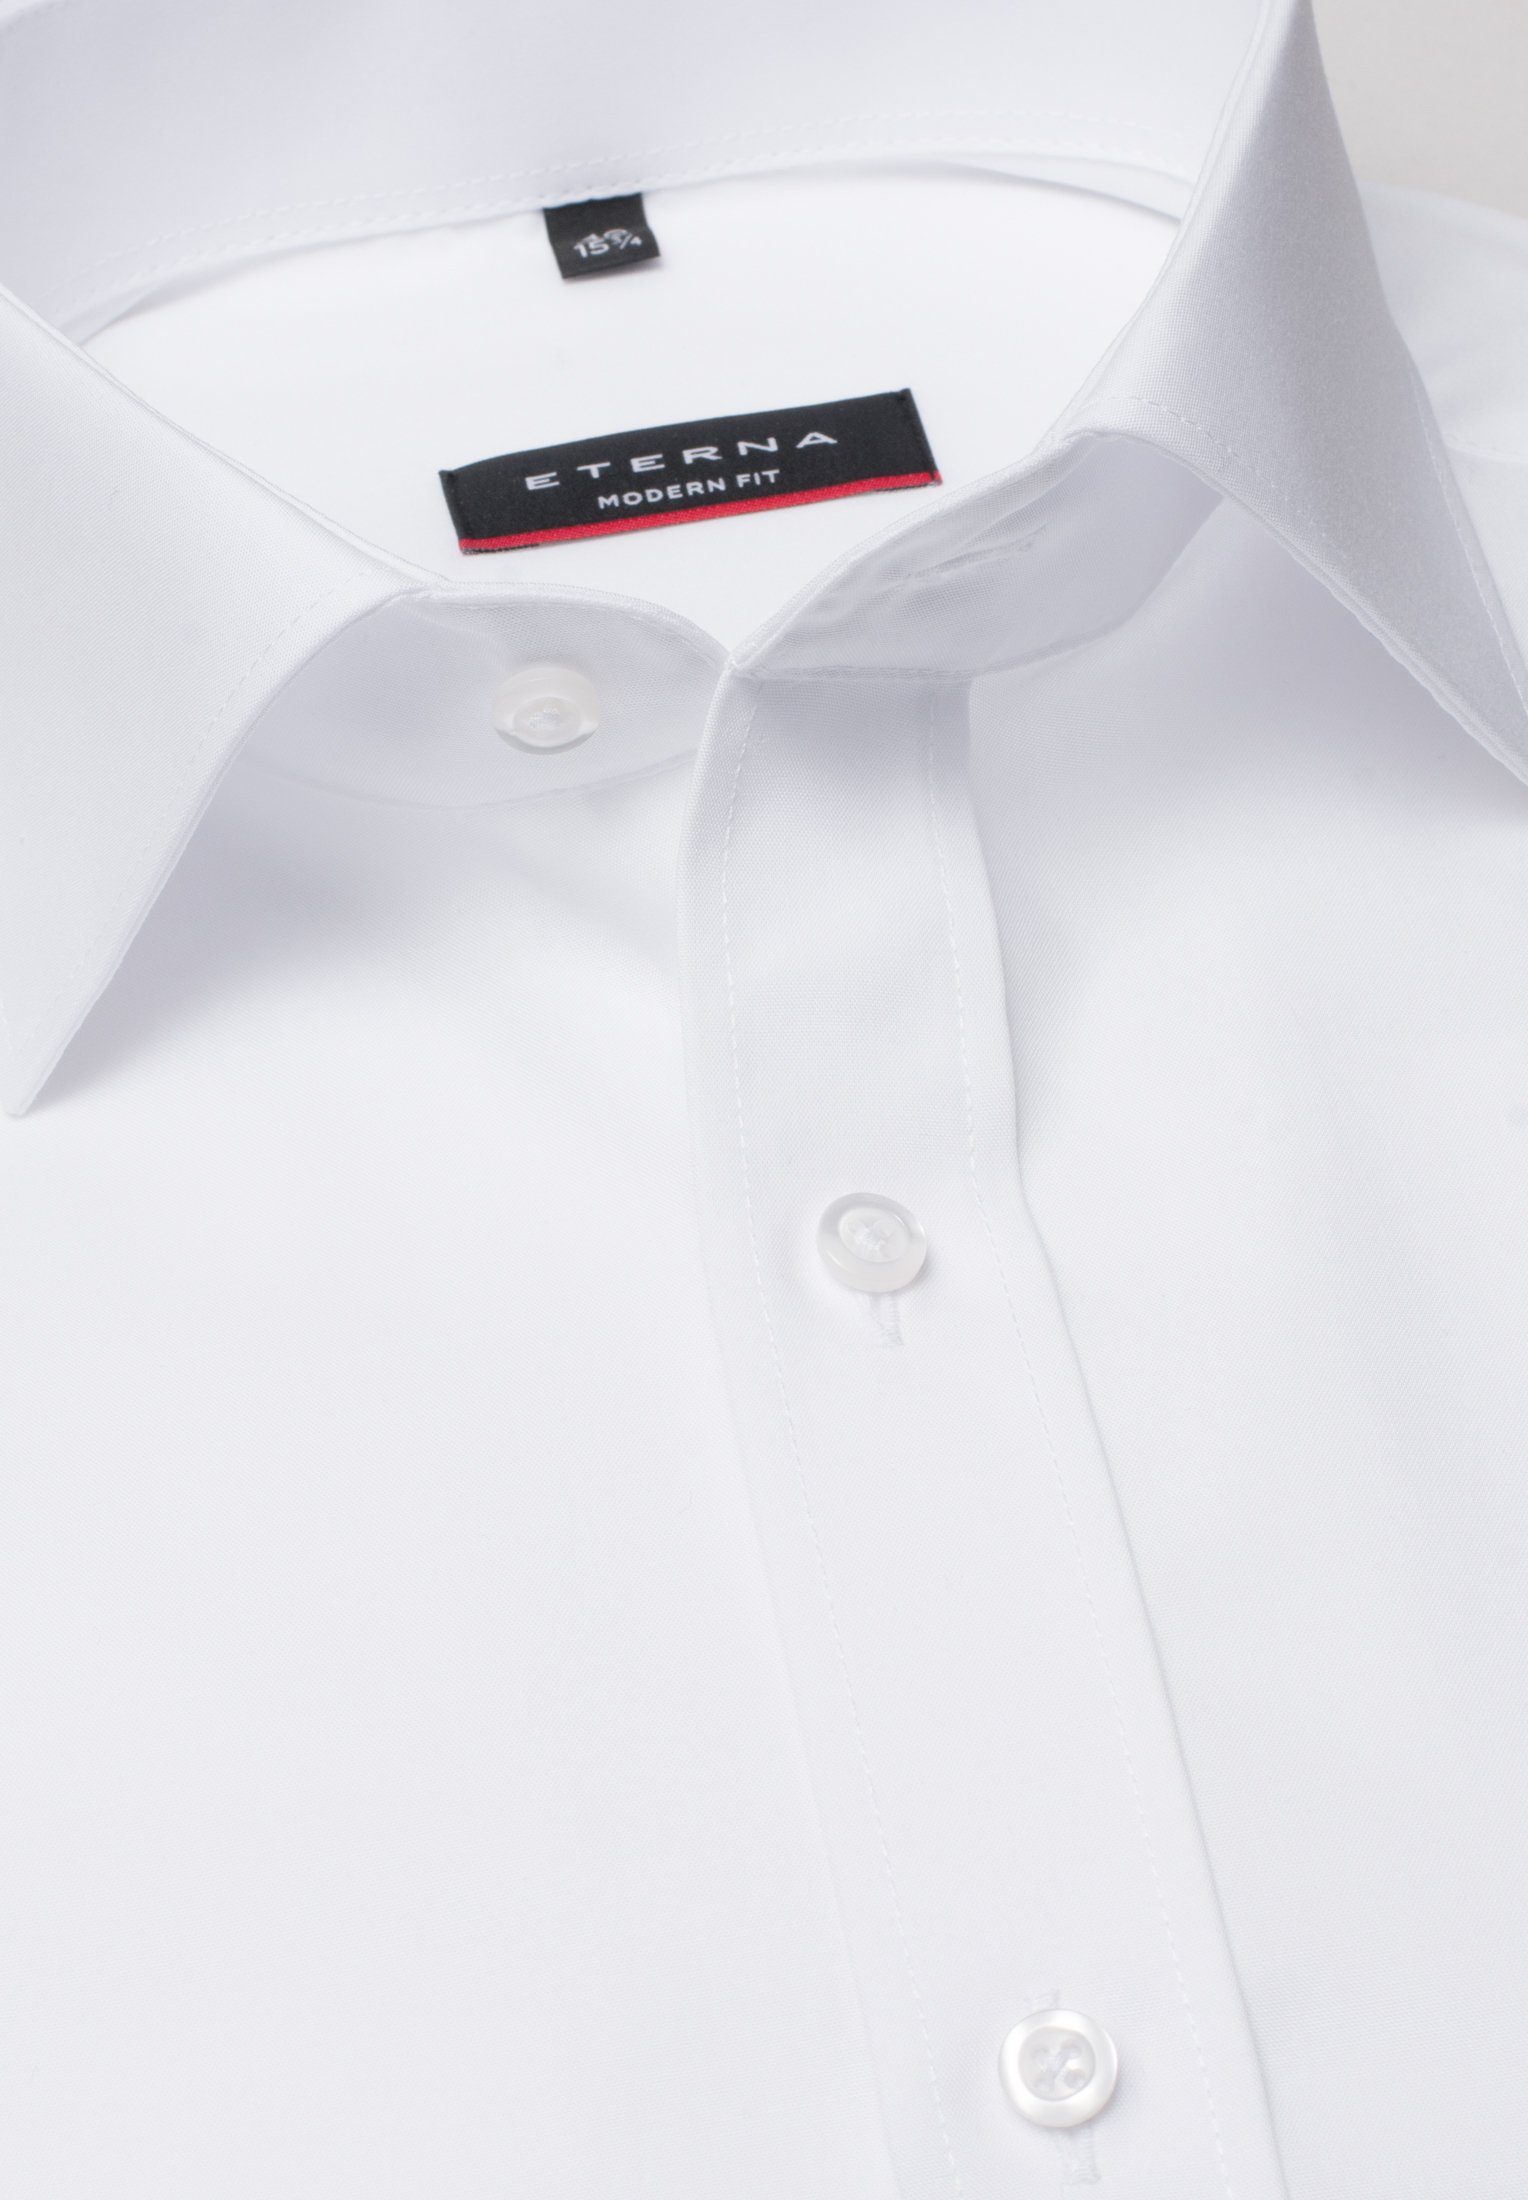 Langarm Online Eterna Hemd Kaufen »modern Fit« 4Sjc3ARLq5